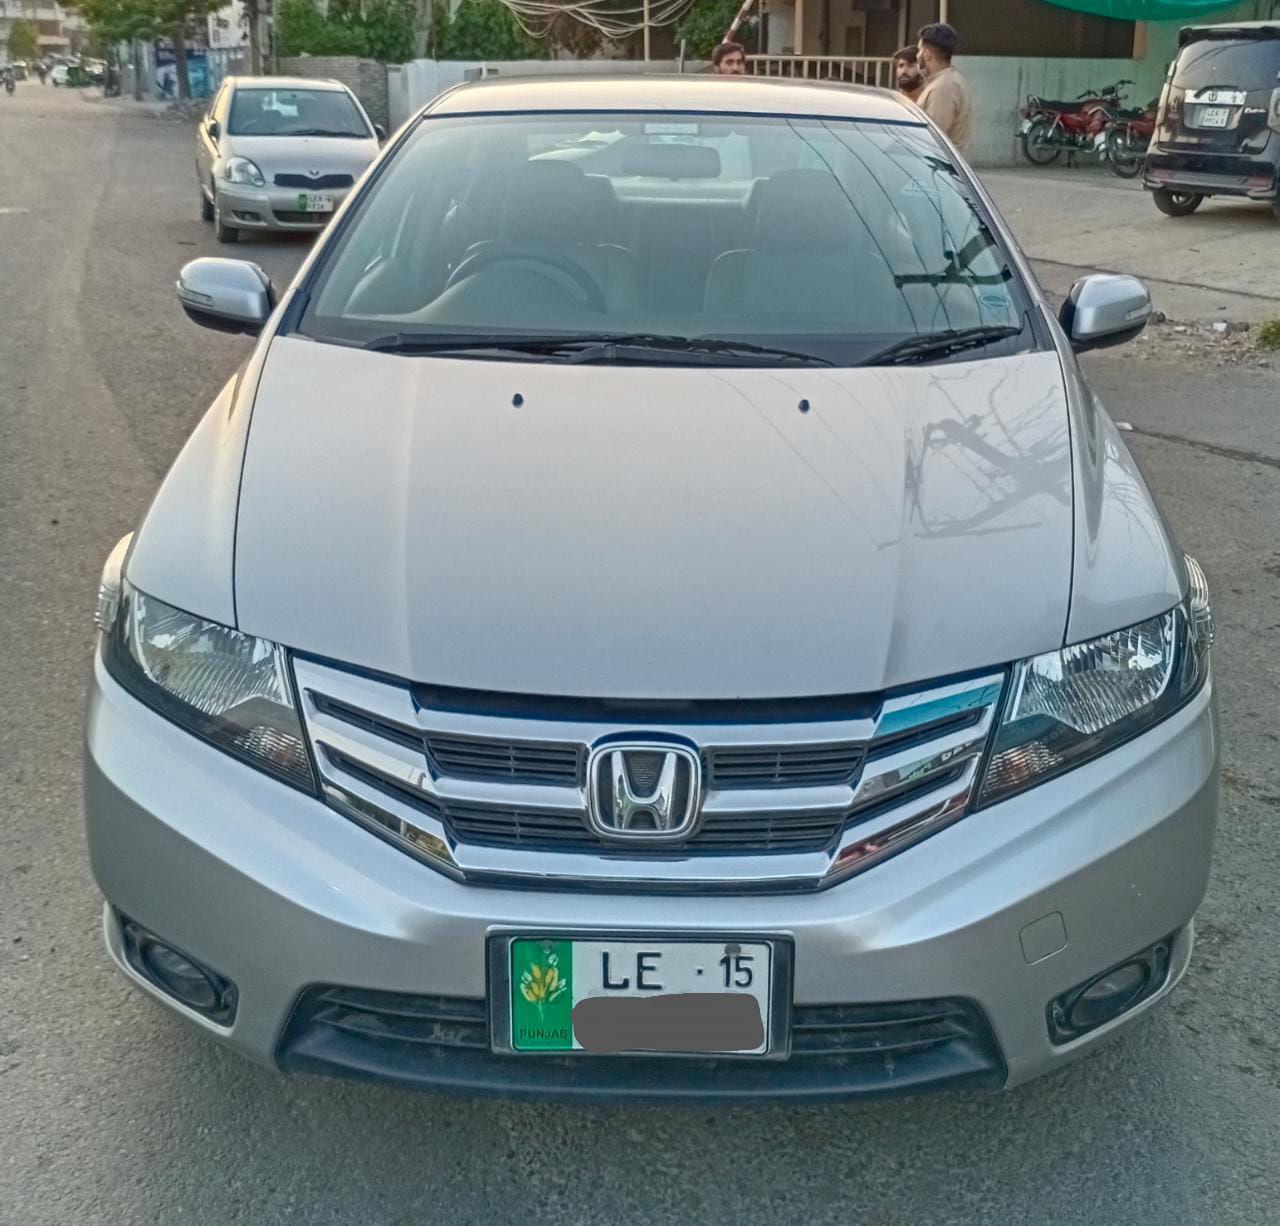 Honda City Aspire 1.5 i-VTEC Prosmatec 2015